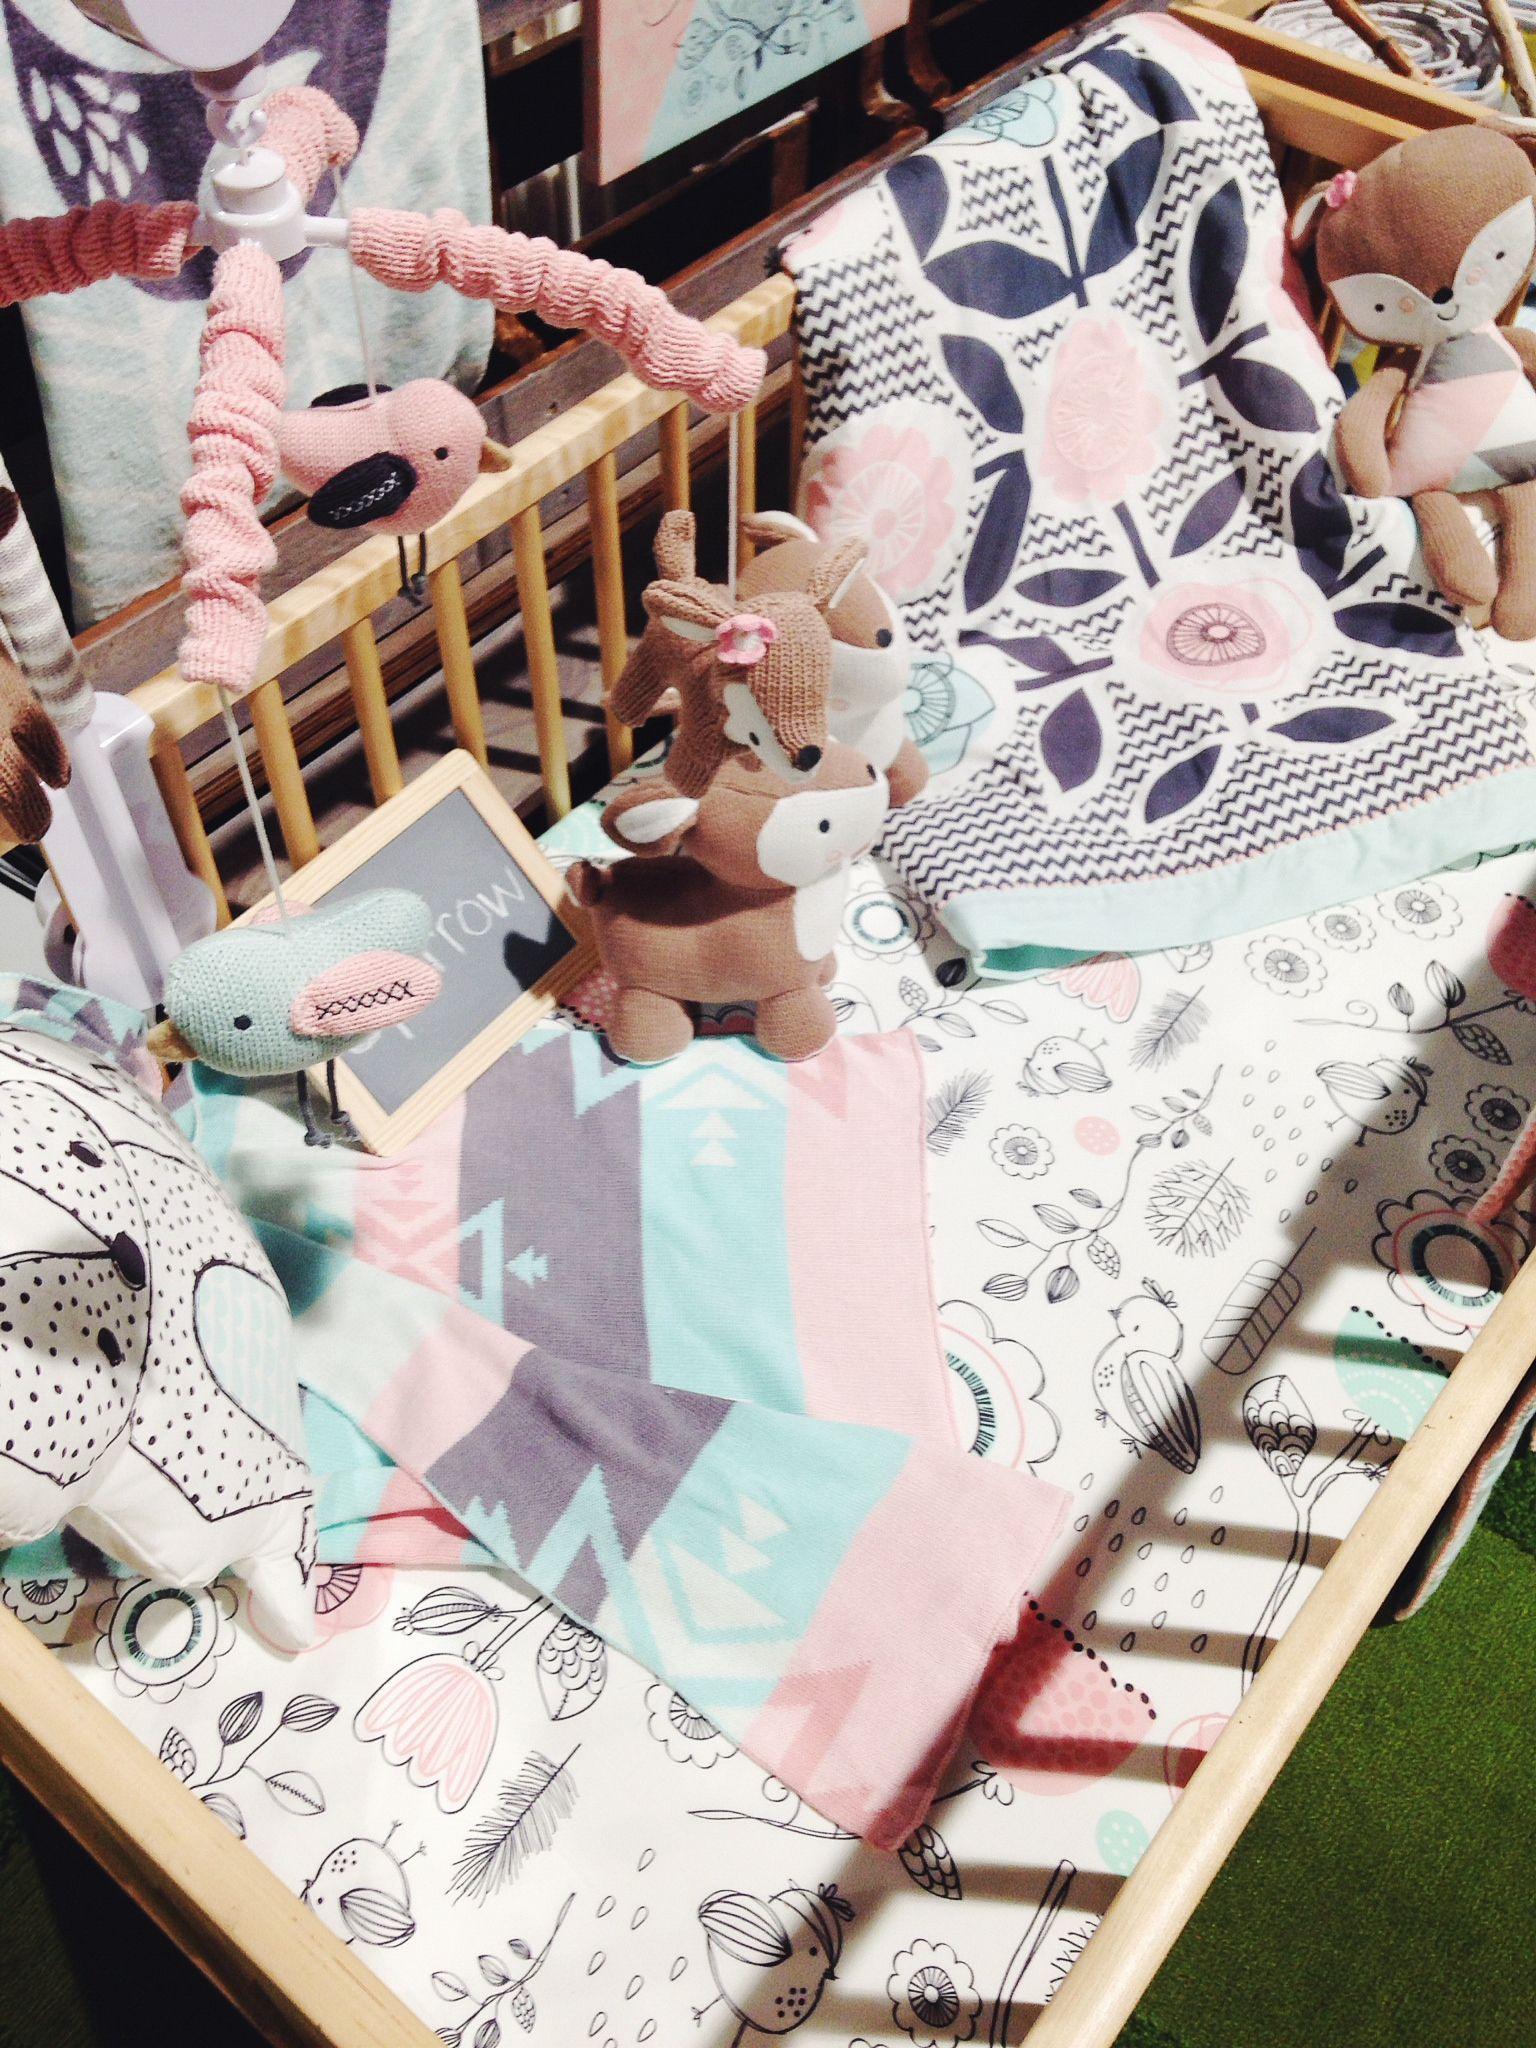 Everything Designish Baby Boy S Nursery: Southwestern Influenced Prints Trending At ABC Kids Expo